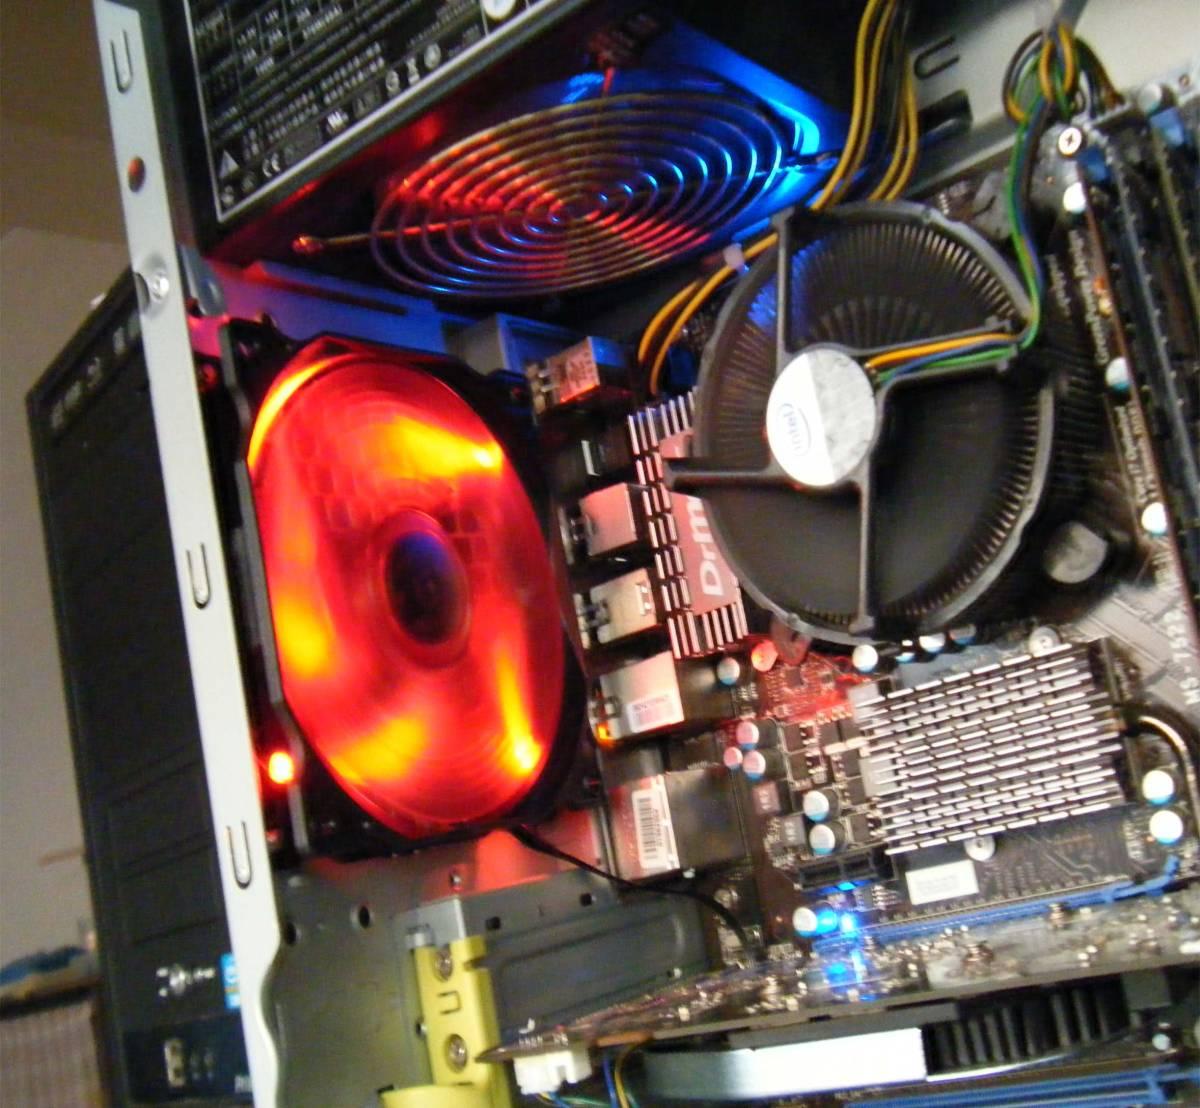 ◆ 秒速/i7 920/自作PMSI X58 ProE/新品SSD 160GB/HDD 1TB/Office2016/Win10Pro ◆_画像3